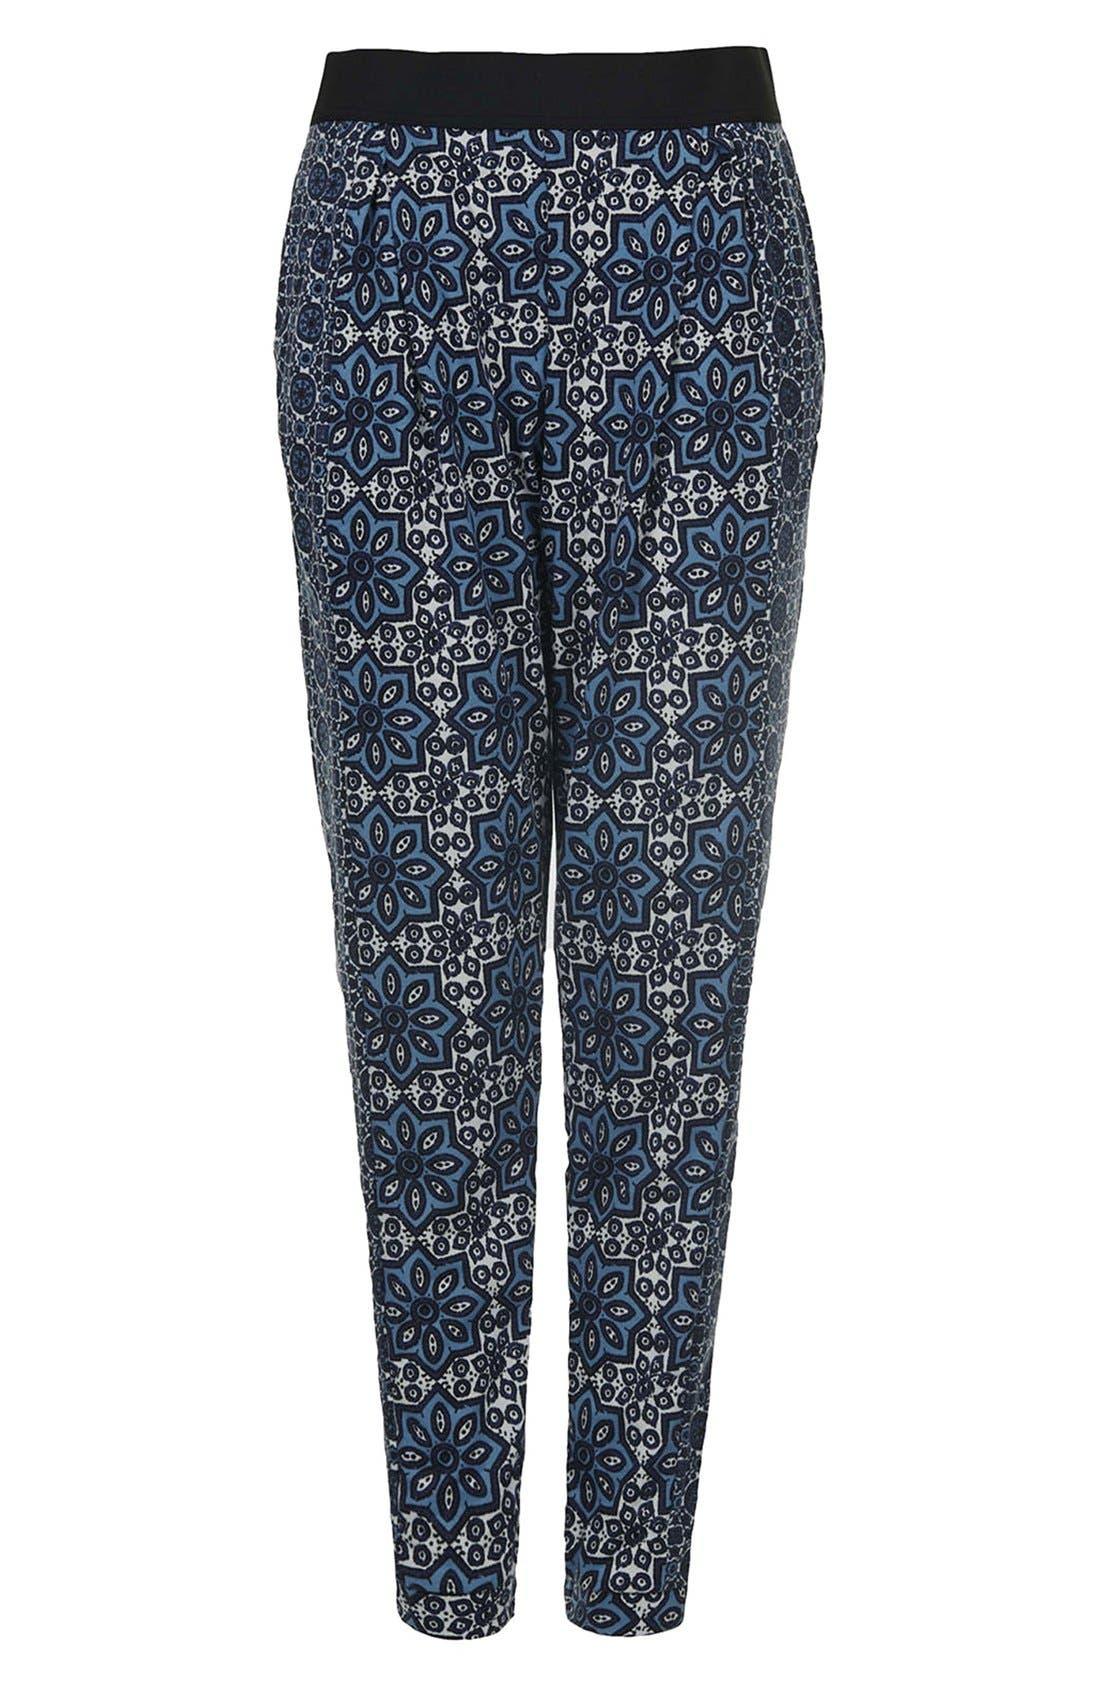 Alternate Image 3  - Topshop Tile Print Jersey Trousers